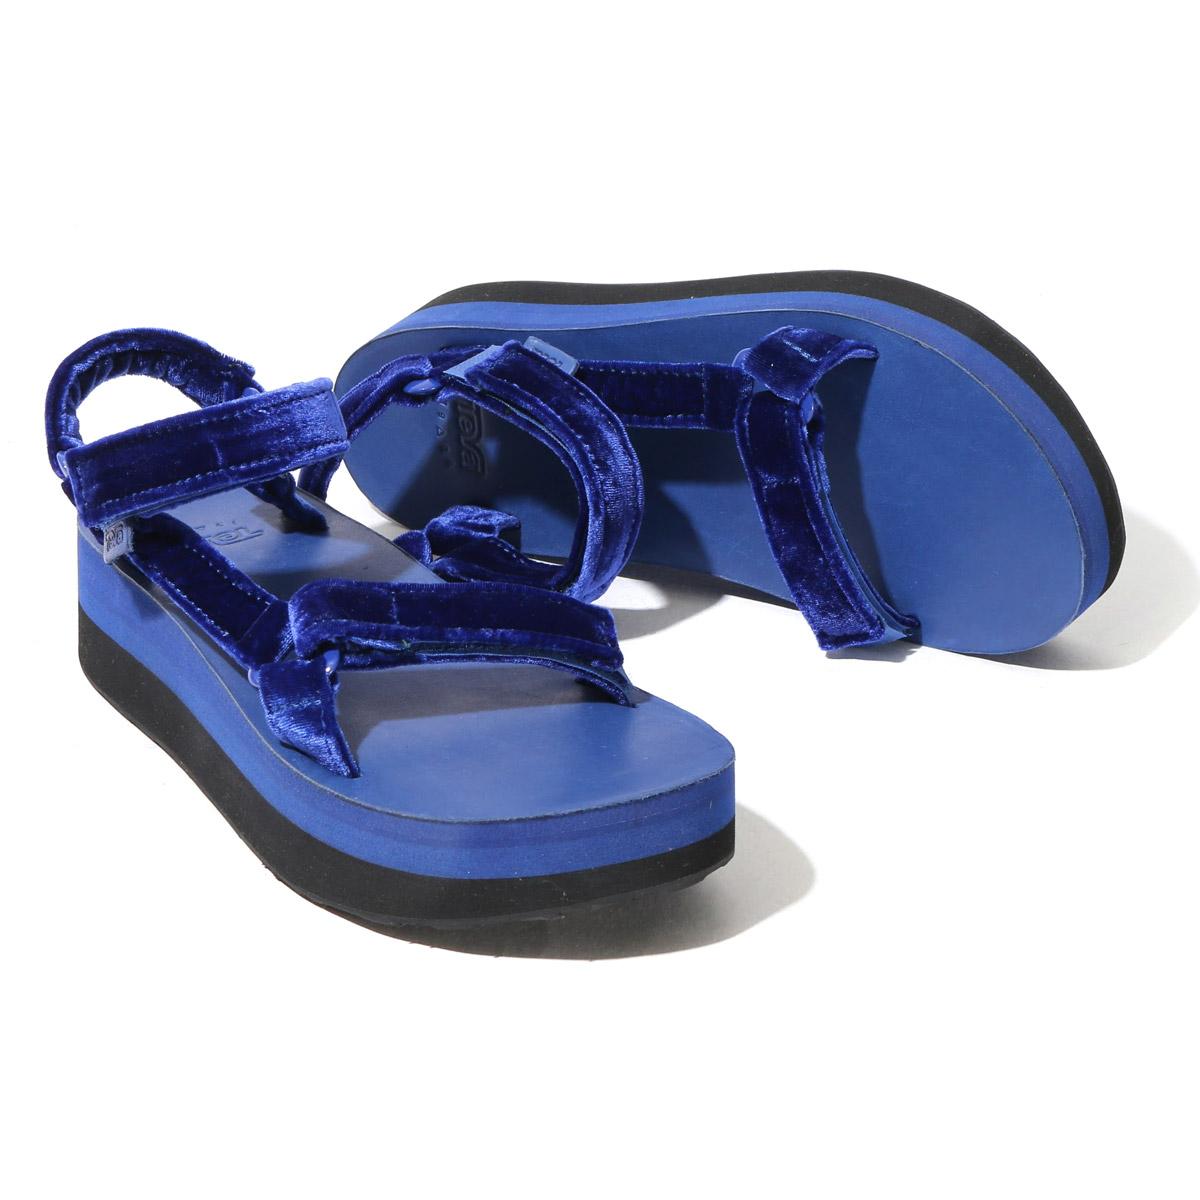 bef2356d1d9 TEVA FLATFORM UNIVERSAL VELVET (Teva flat form older brother decorative  collar LebeL Bet) (BLUE) 17FW-I